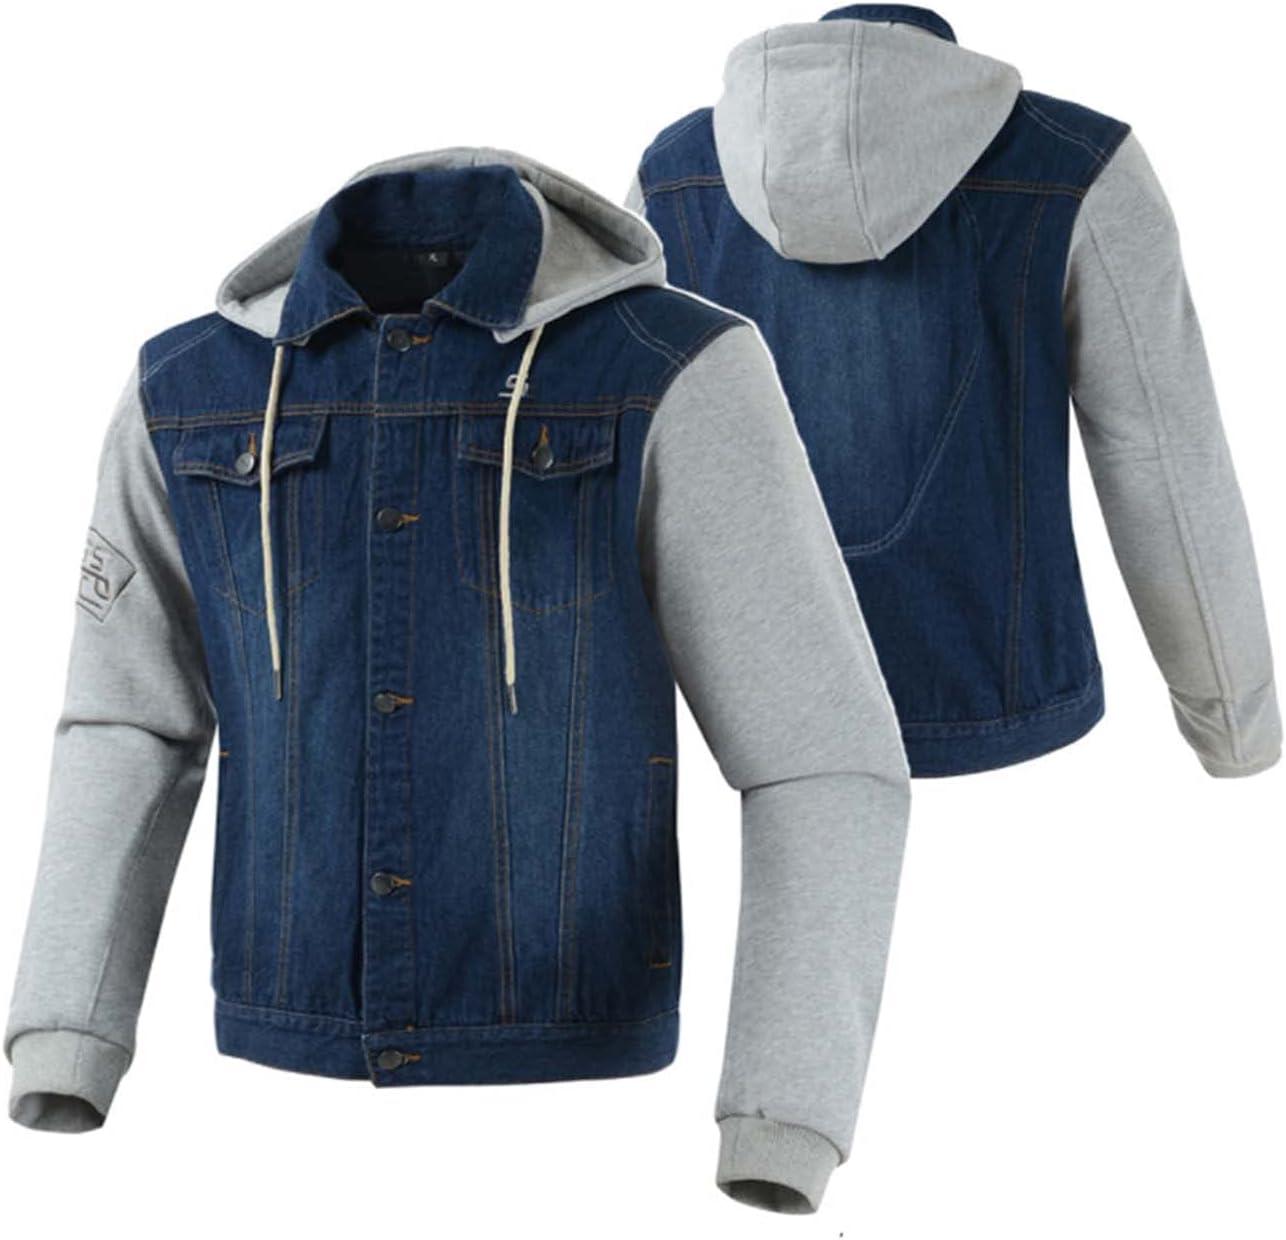 CCCYT Motorcycle Motorbike Protective San Jose Mall Jacket Armoured Regular discount Mu Textile